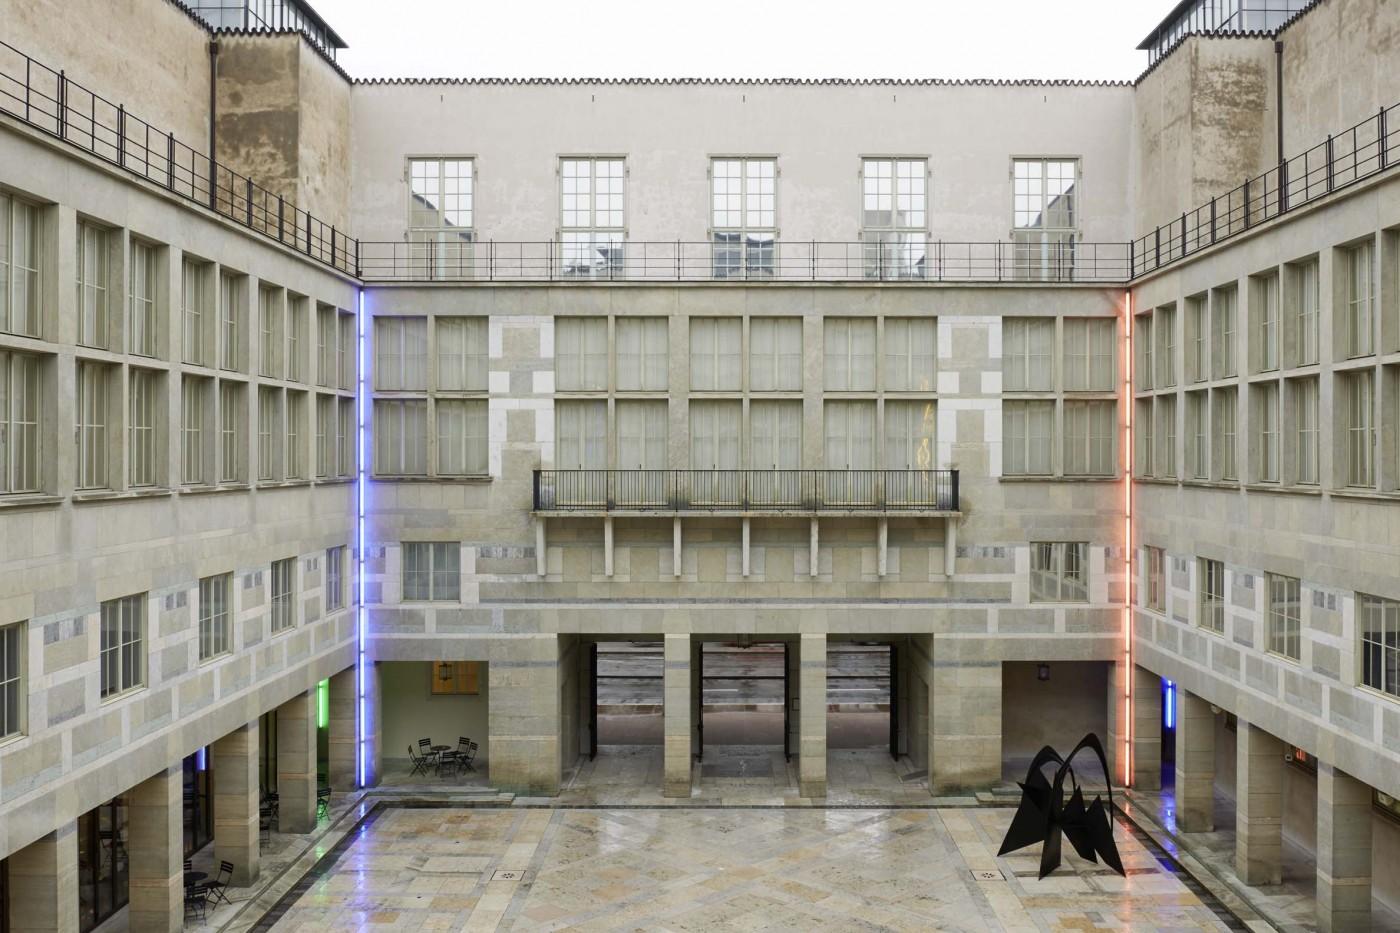 Piet Mondrian – Barnett Newman – Dan Flavin